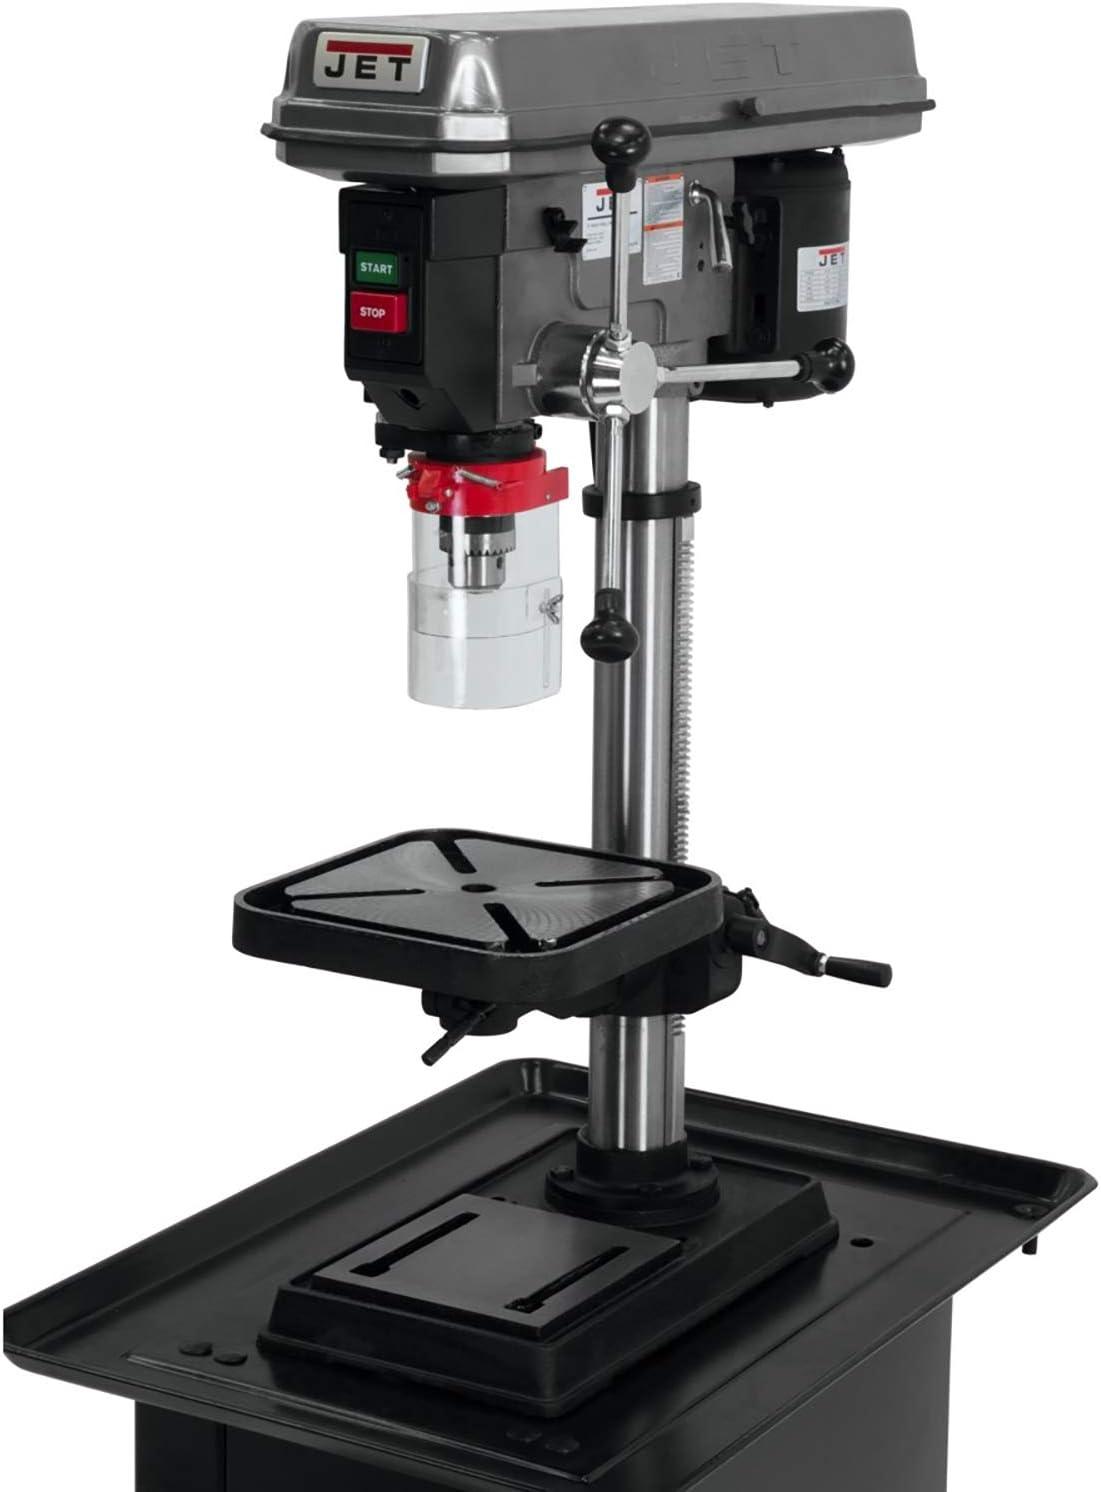 "JET J-2530 15"" Bench Model Drill Press, 115V 1Ph (354401)"